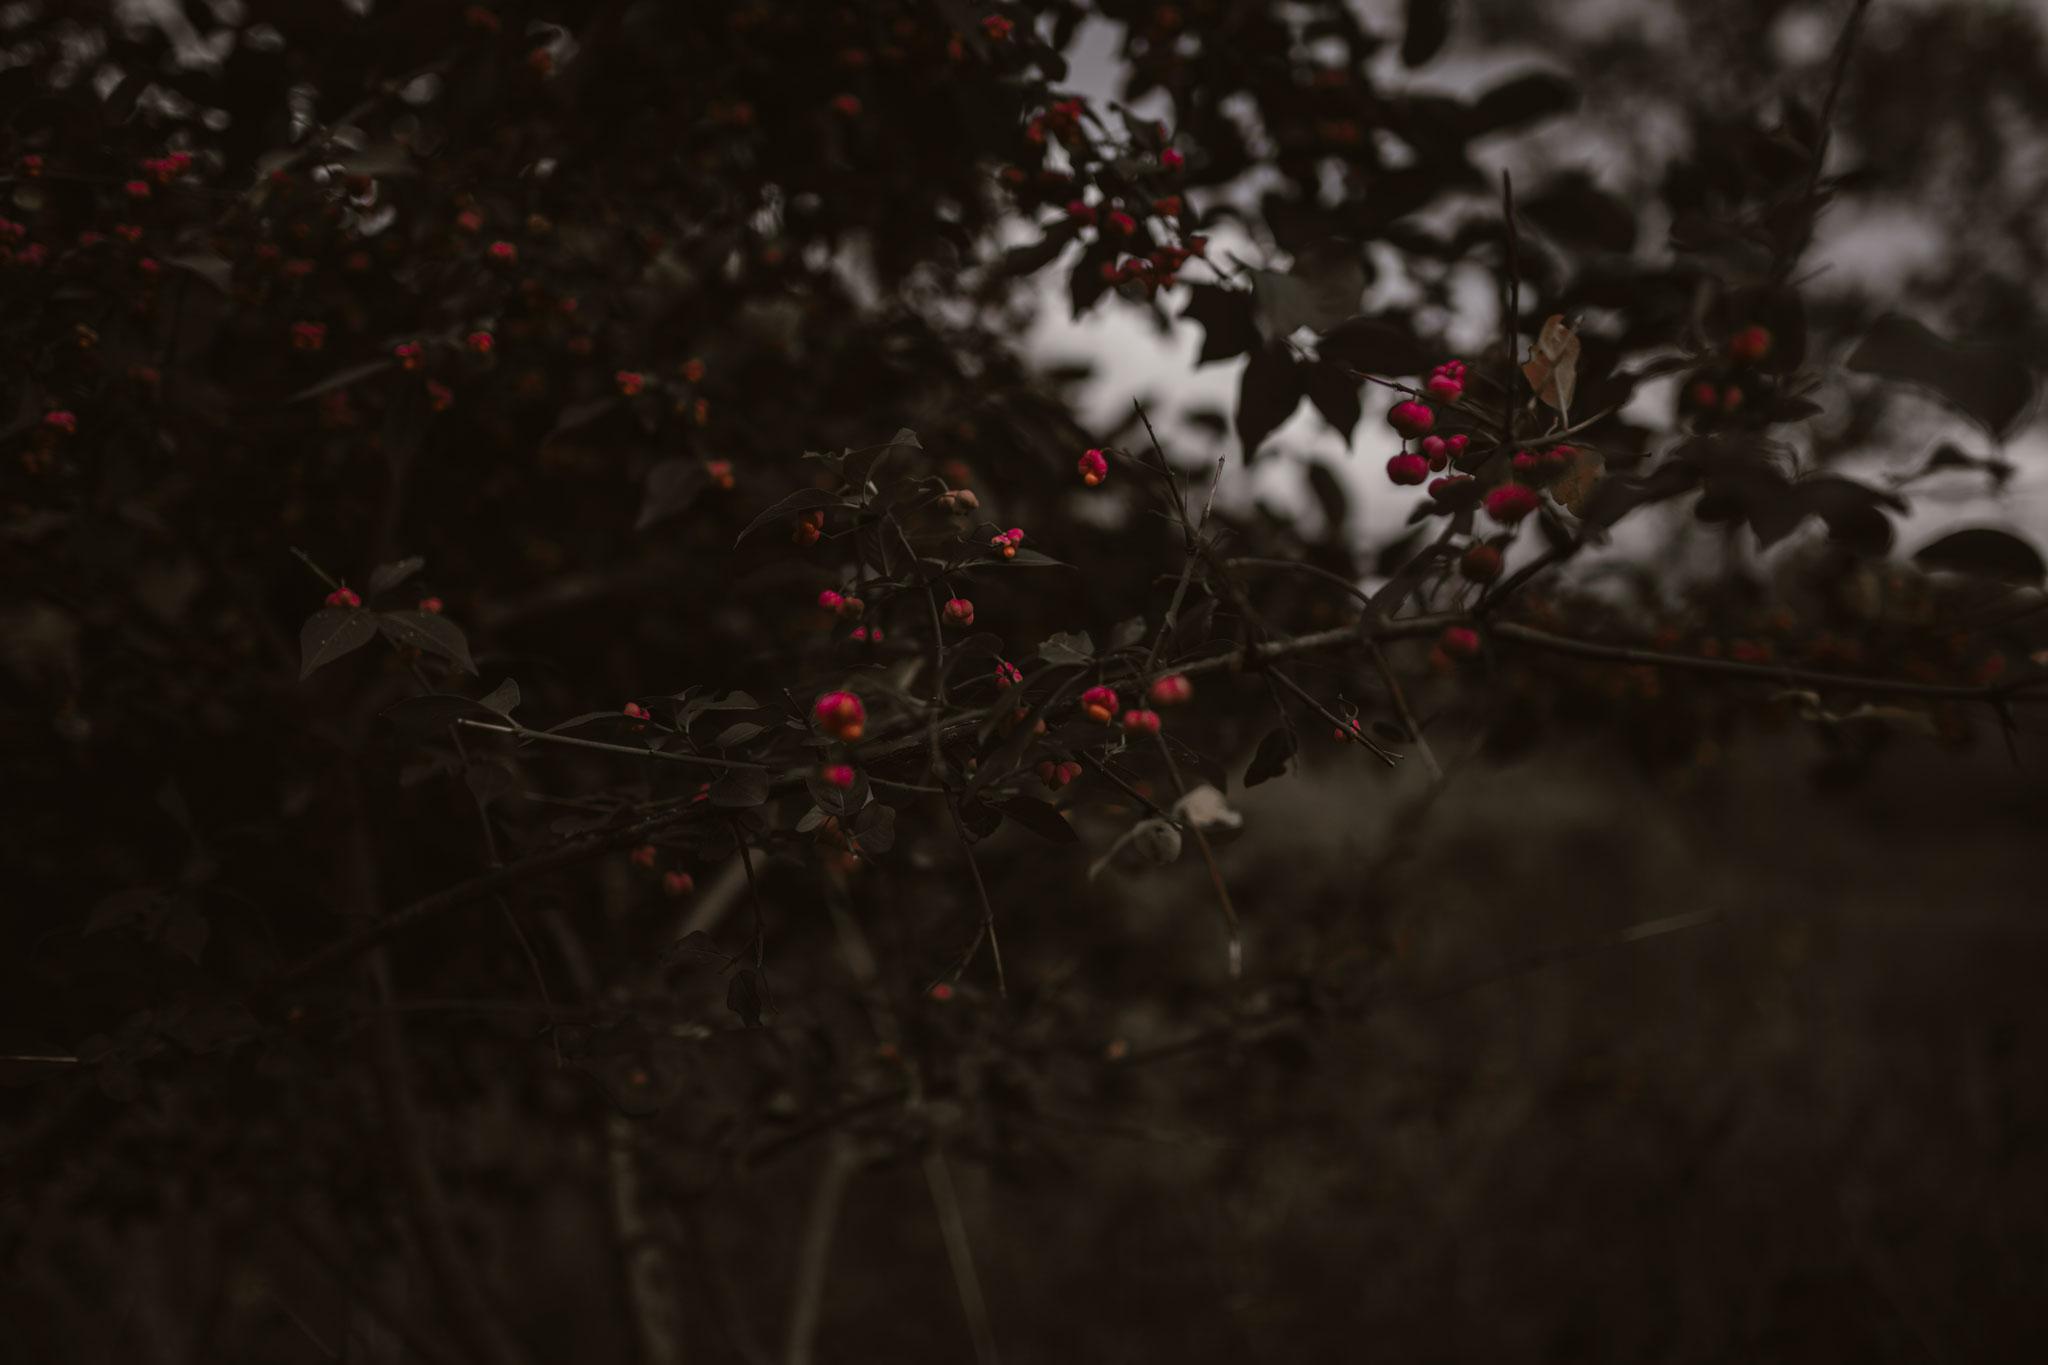 pale-witch-152fb.jpg